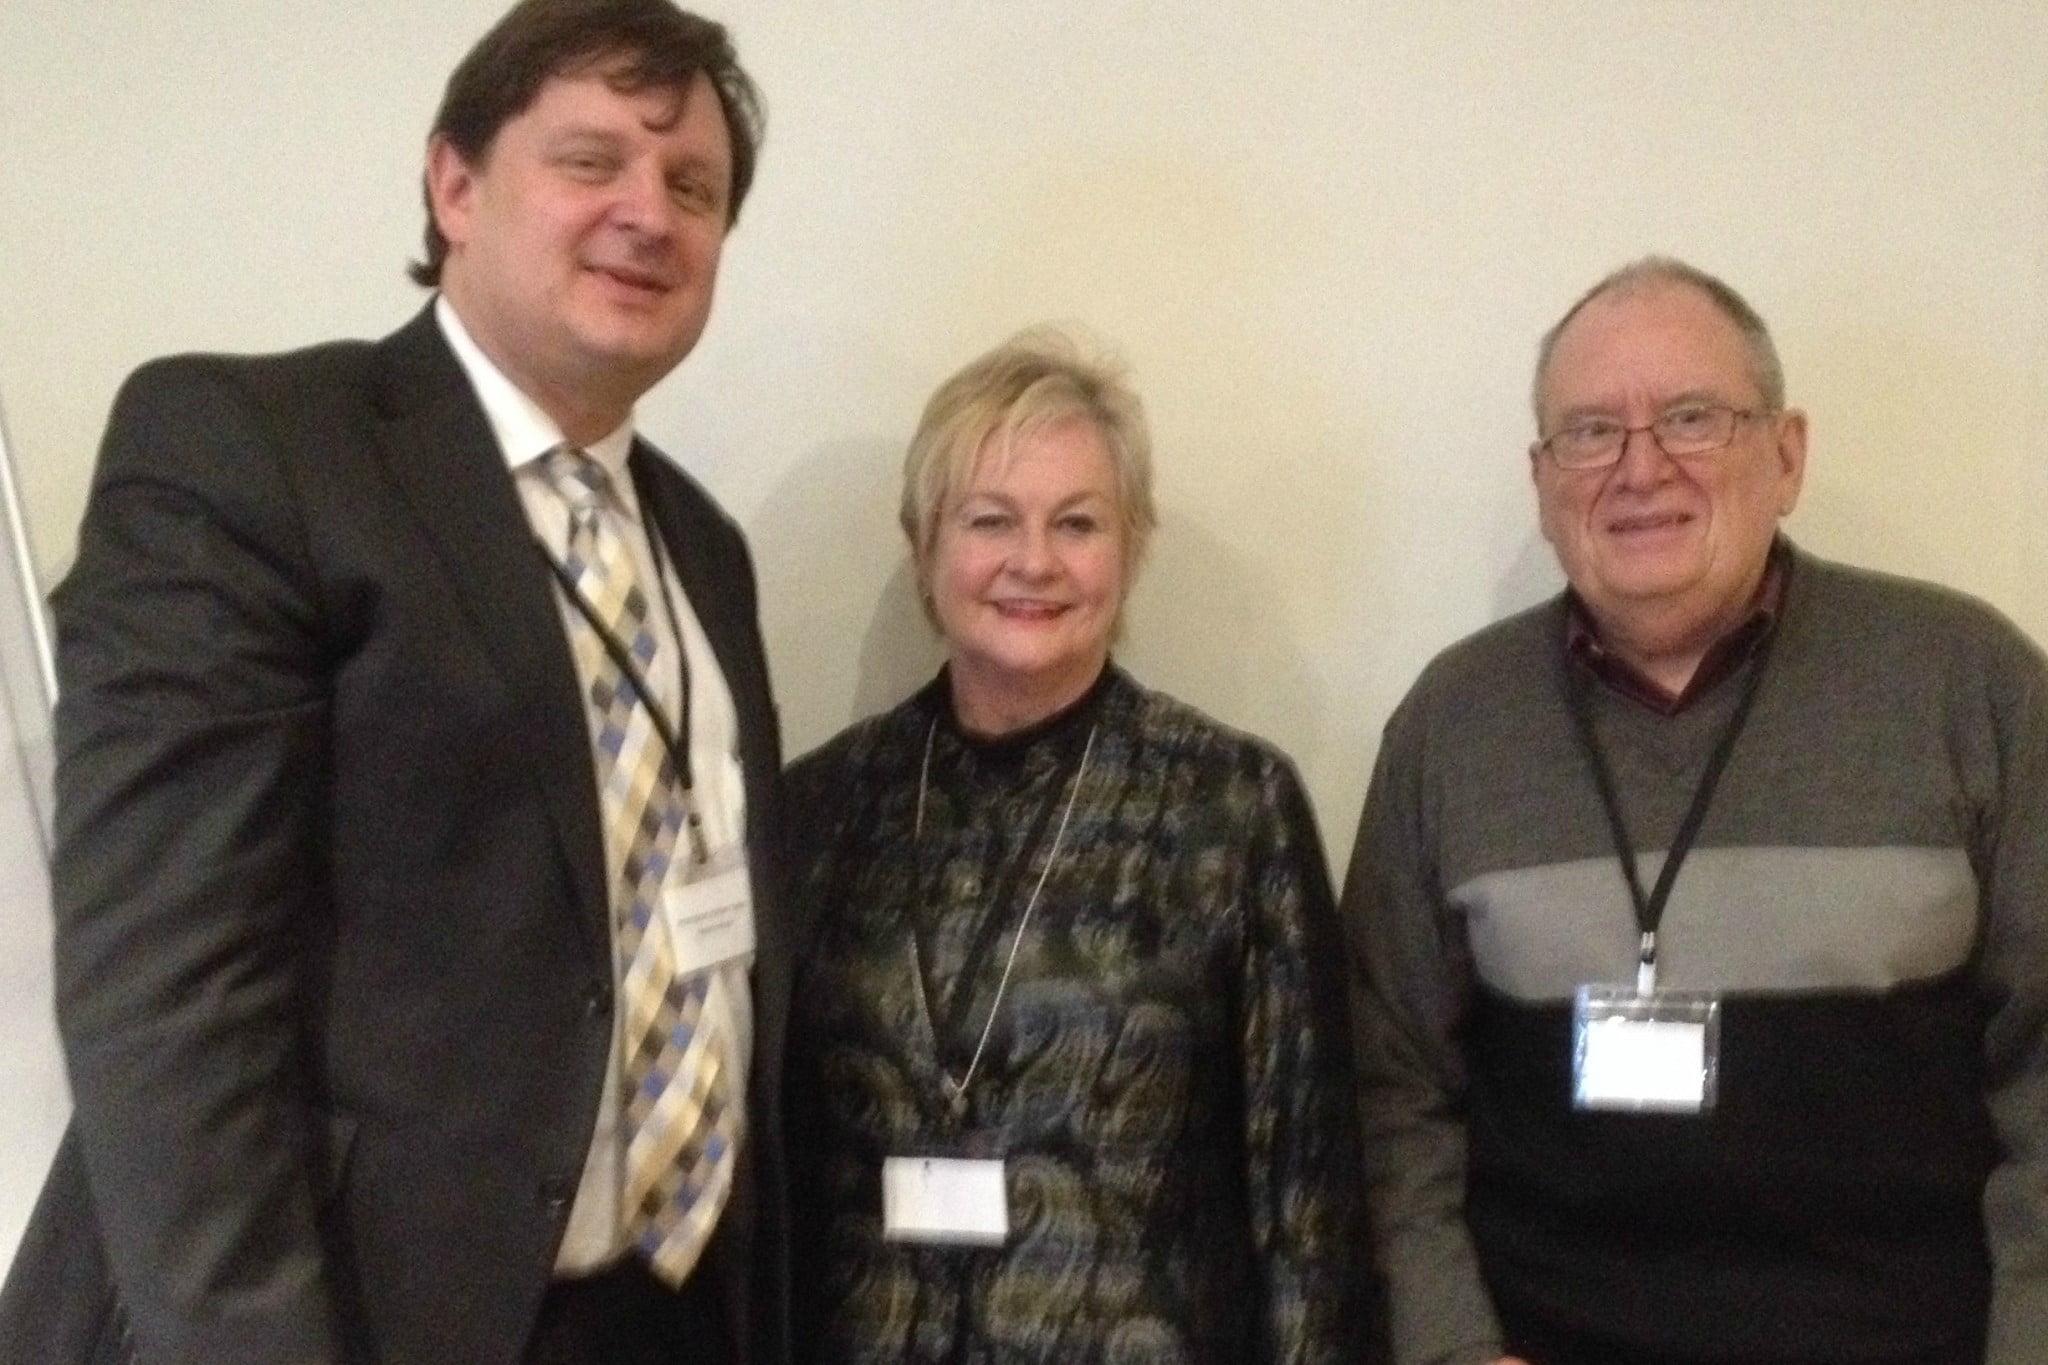 Pictured: Professor Stephen Twigg, Associate Professor Margaret McGill, Professor Ian Spence